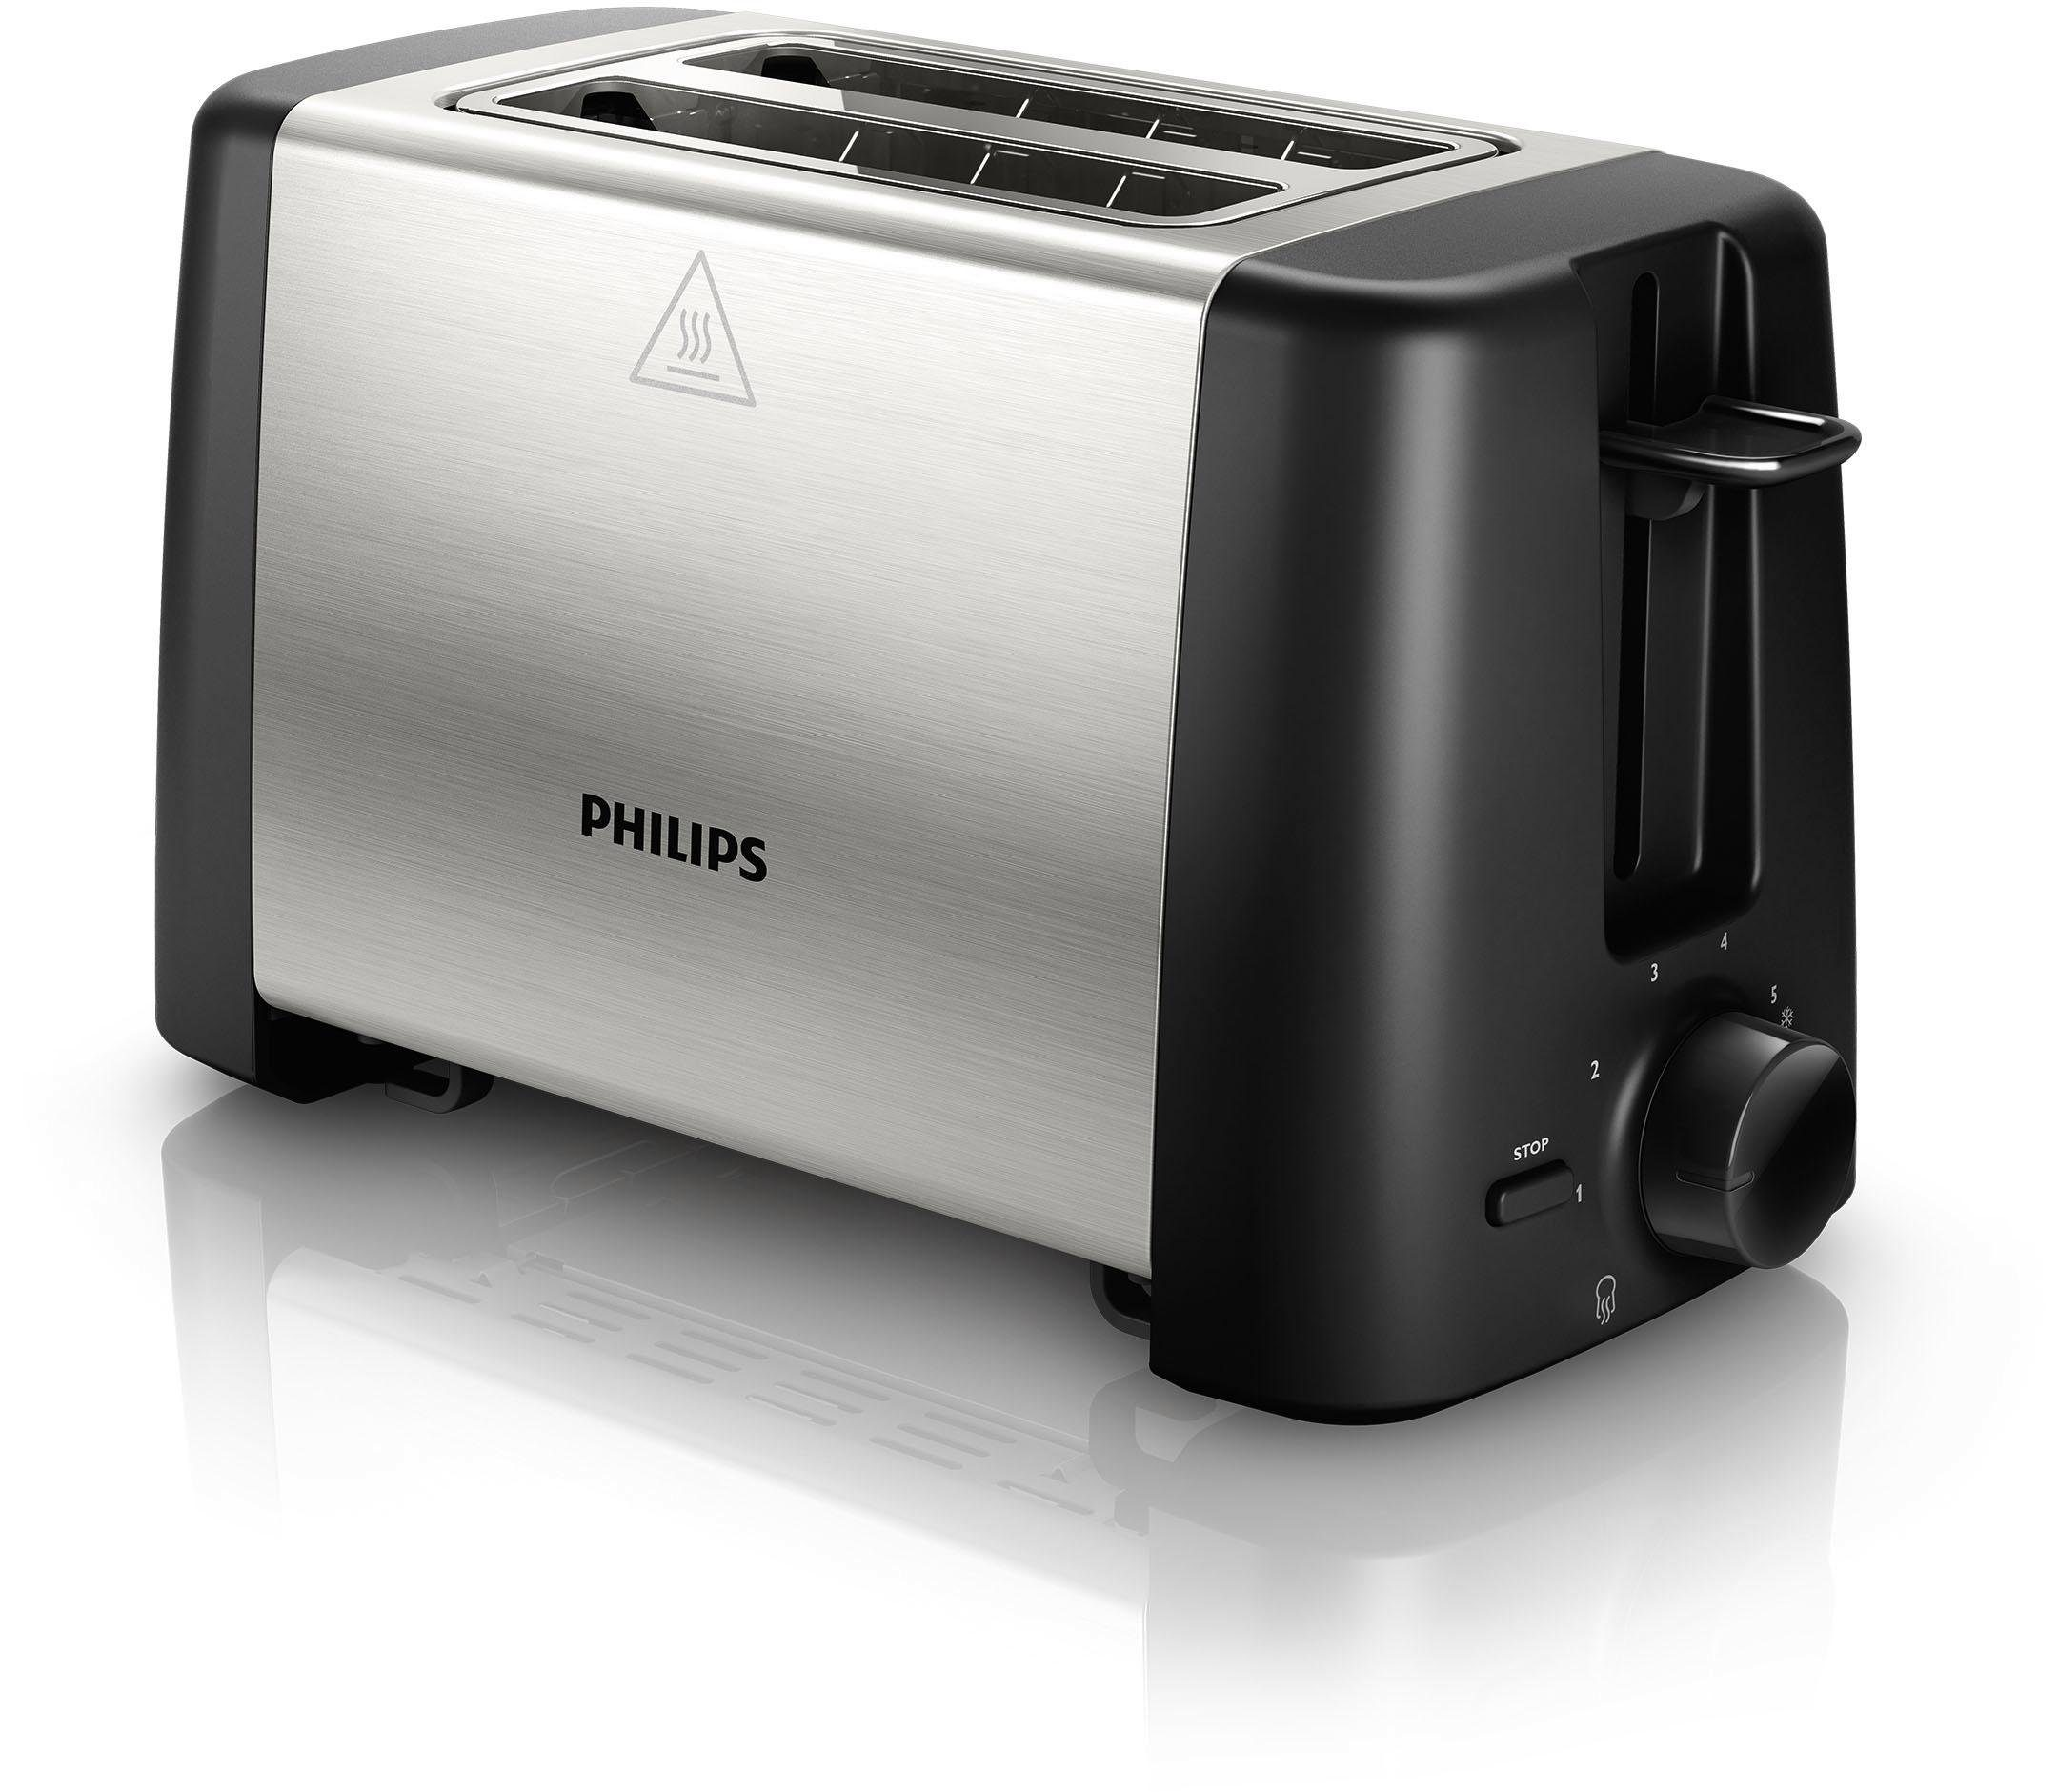 Philips Toaster HD4825/90, 800 W, Auftau- und Aufwärmfunktion